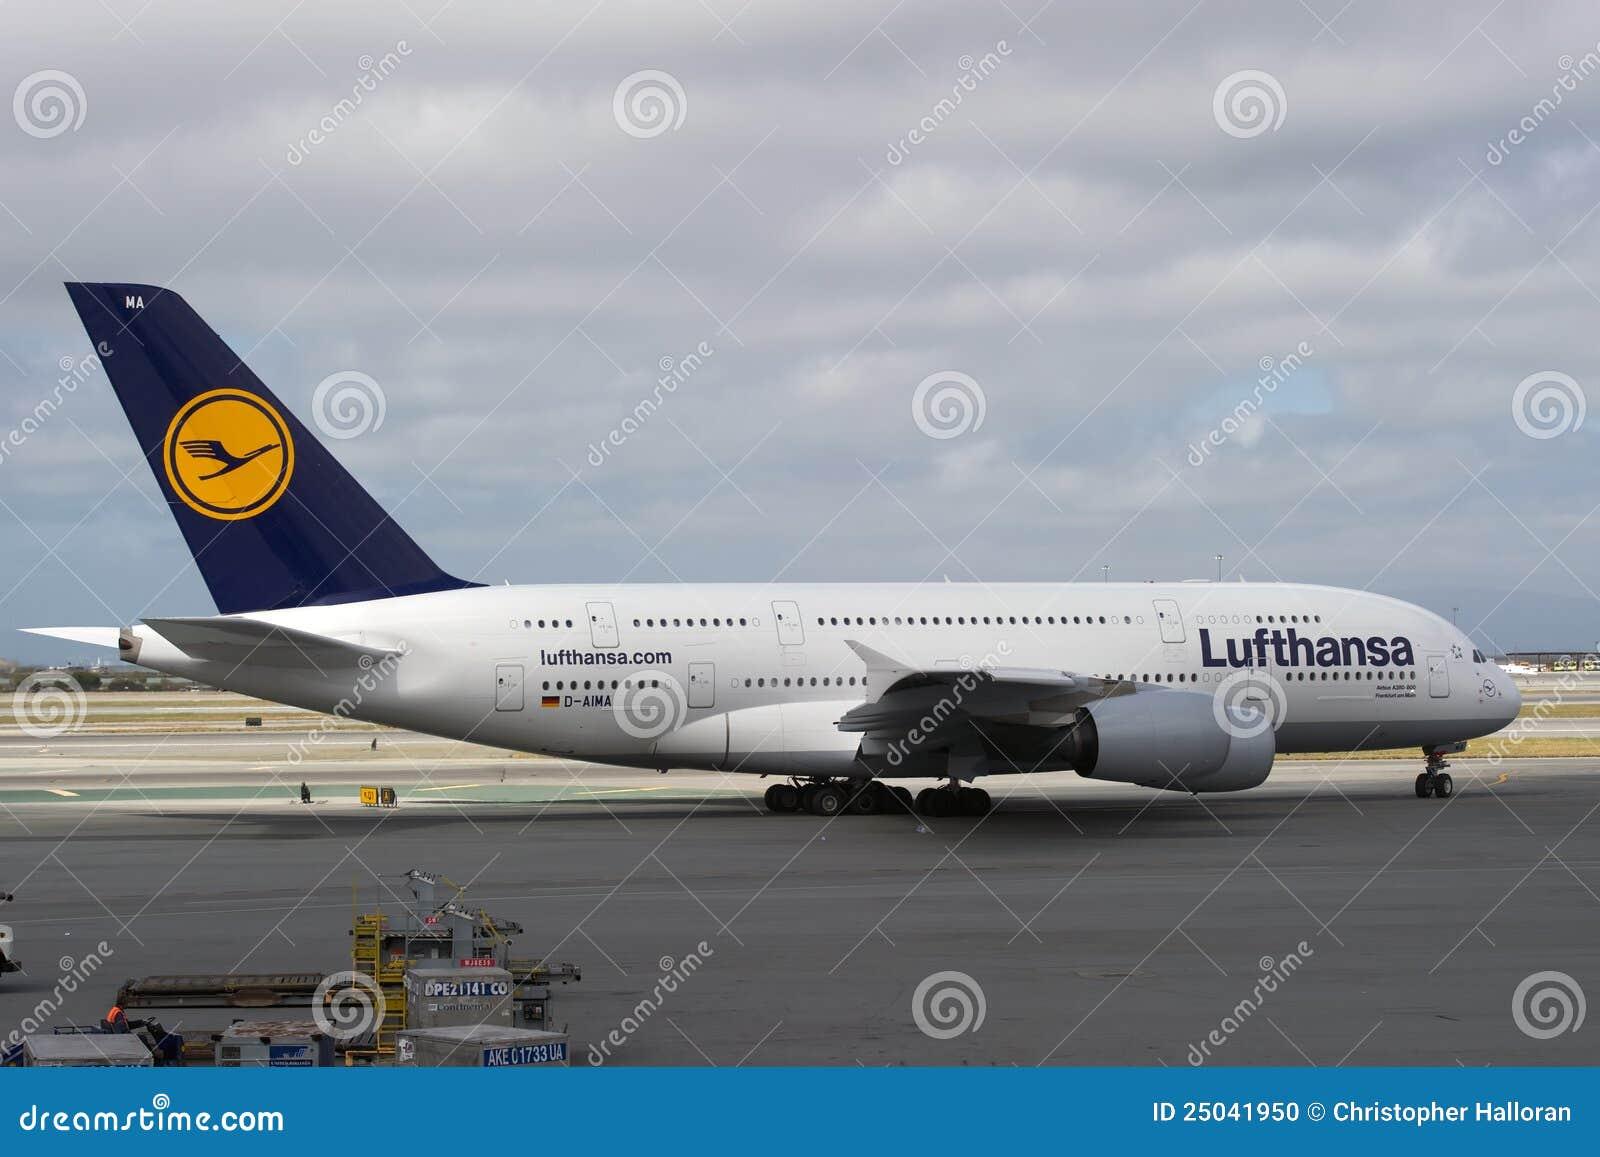 A380 flygbuss lufthansa